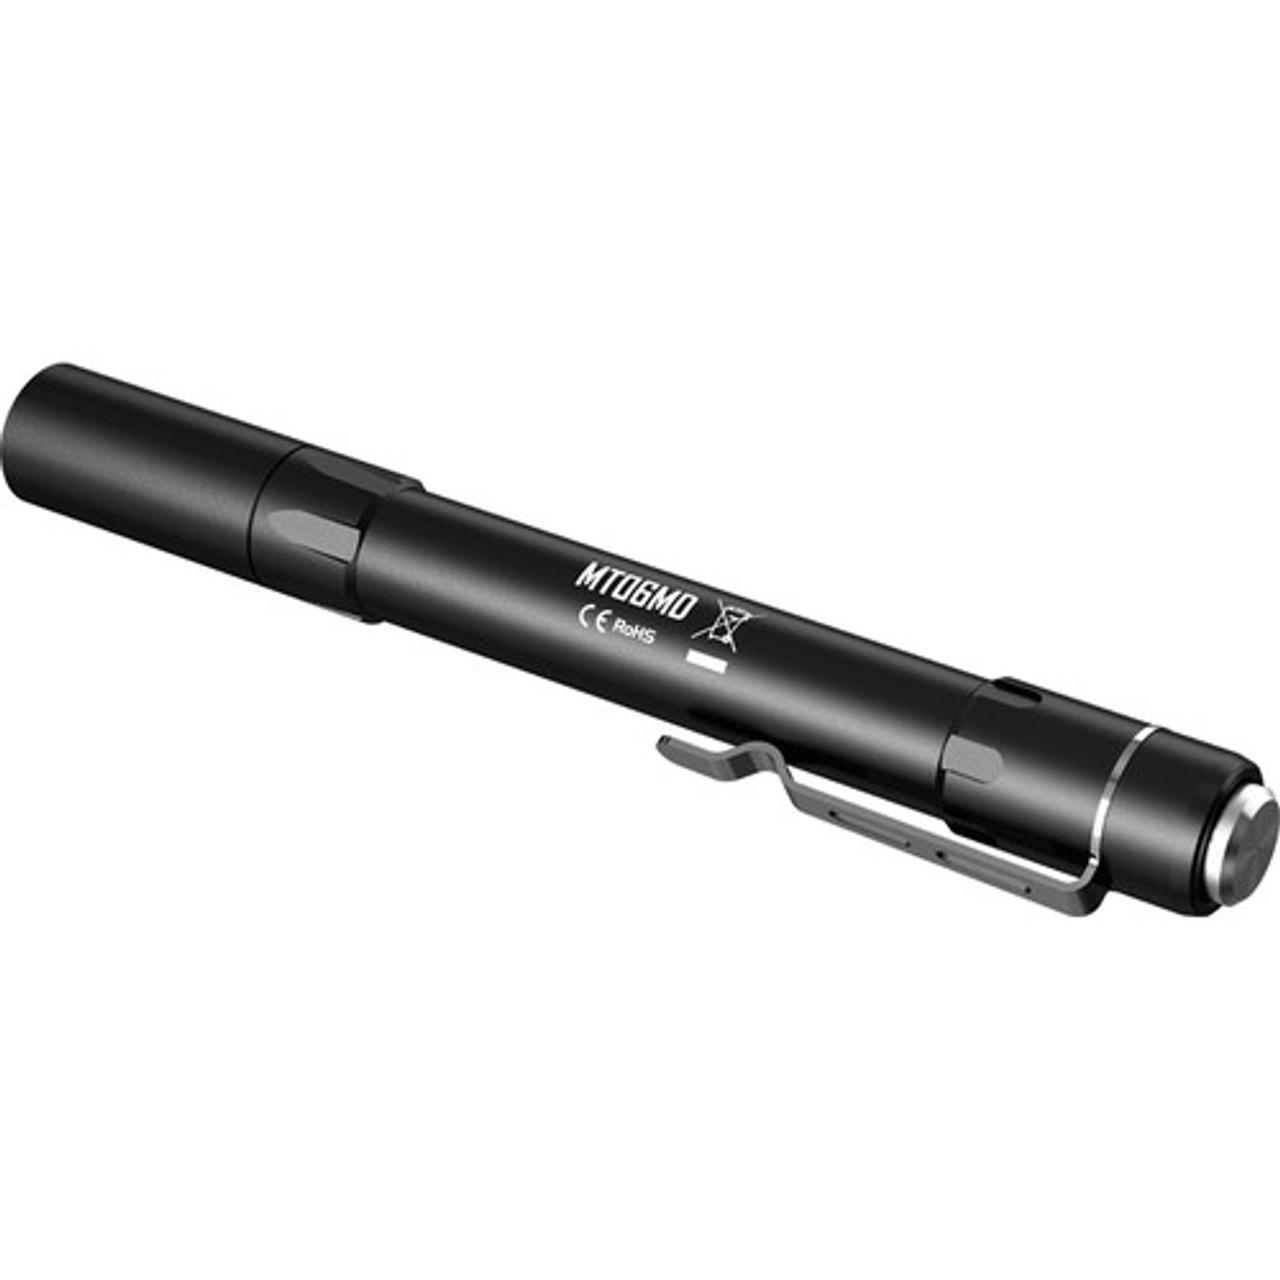 Nitecore MT06MD Penlight